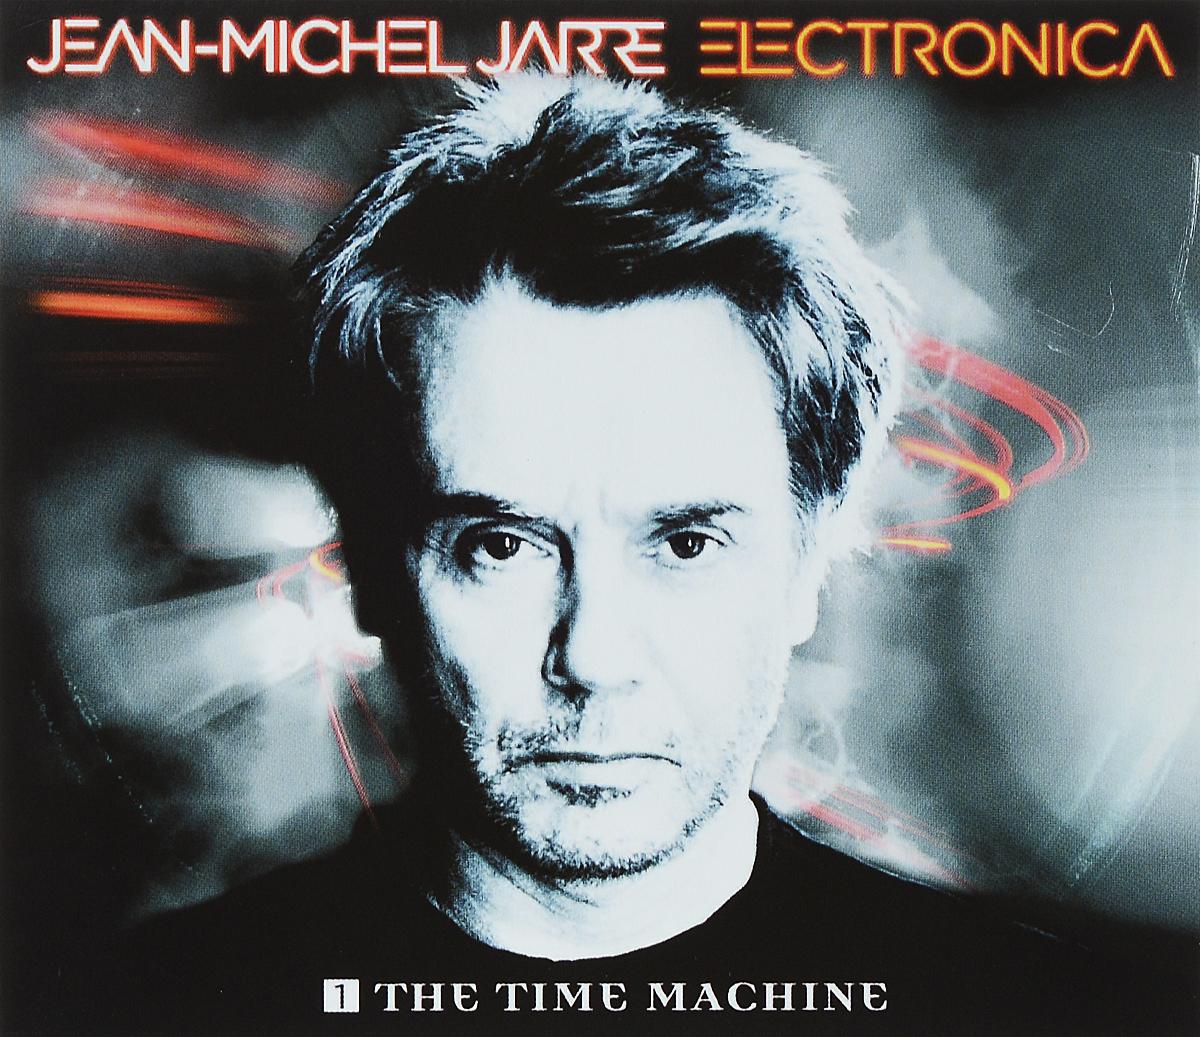 Жан-Мишель Жарр Jean Michel Jarre. Electronica 1 - The Time Machine жан мишель жарр jean michel jarre electronica 1 the time machine